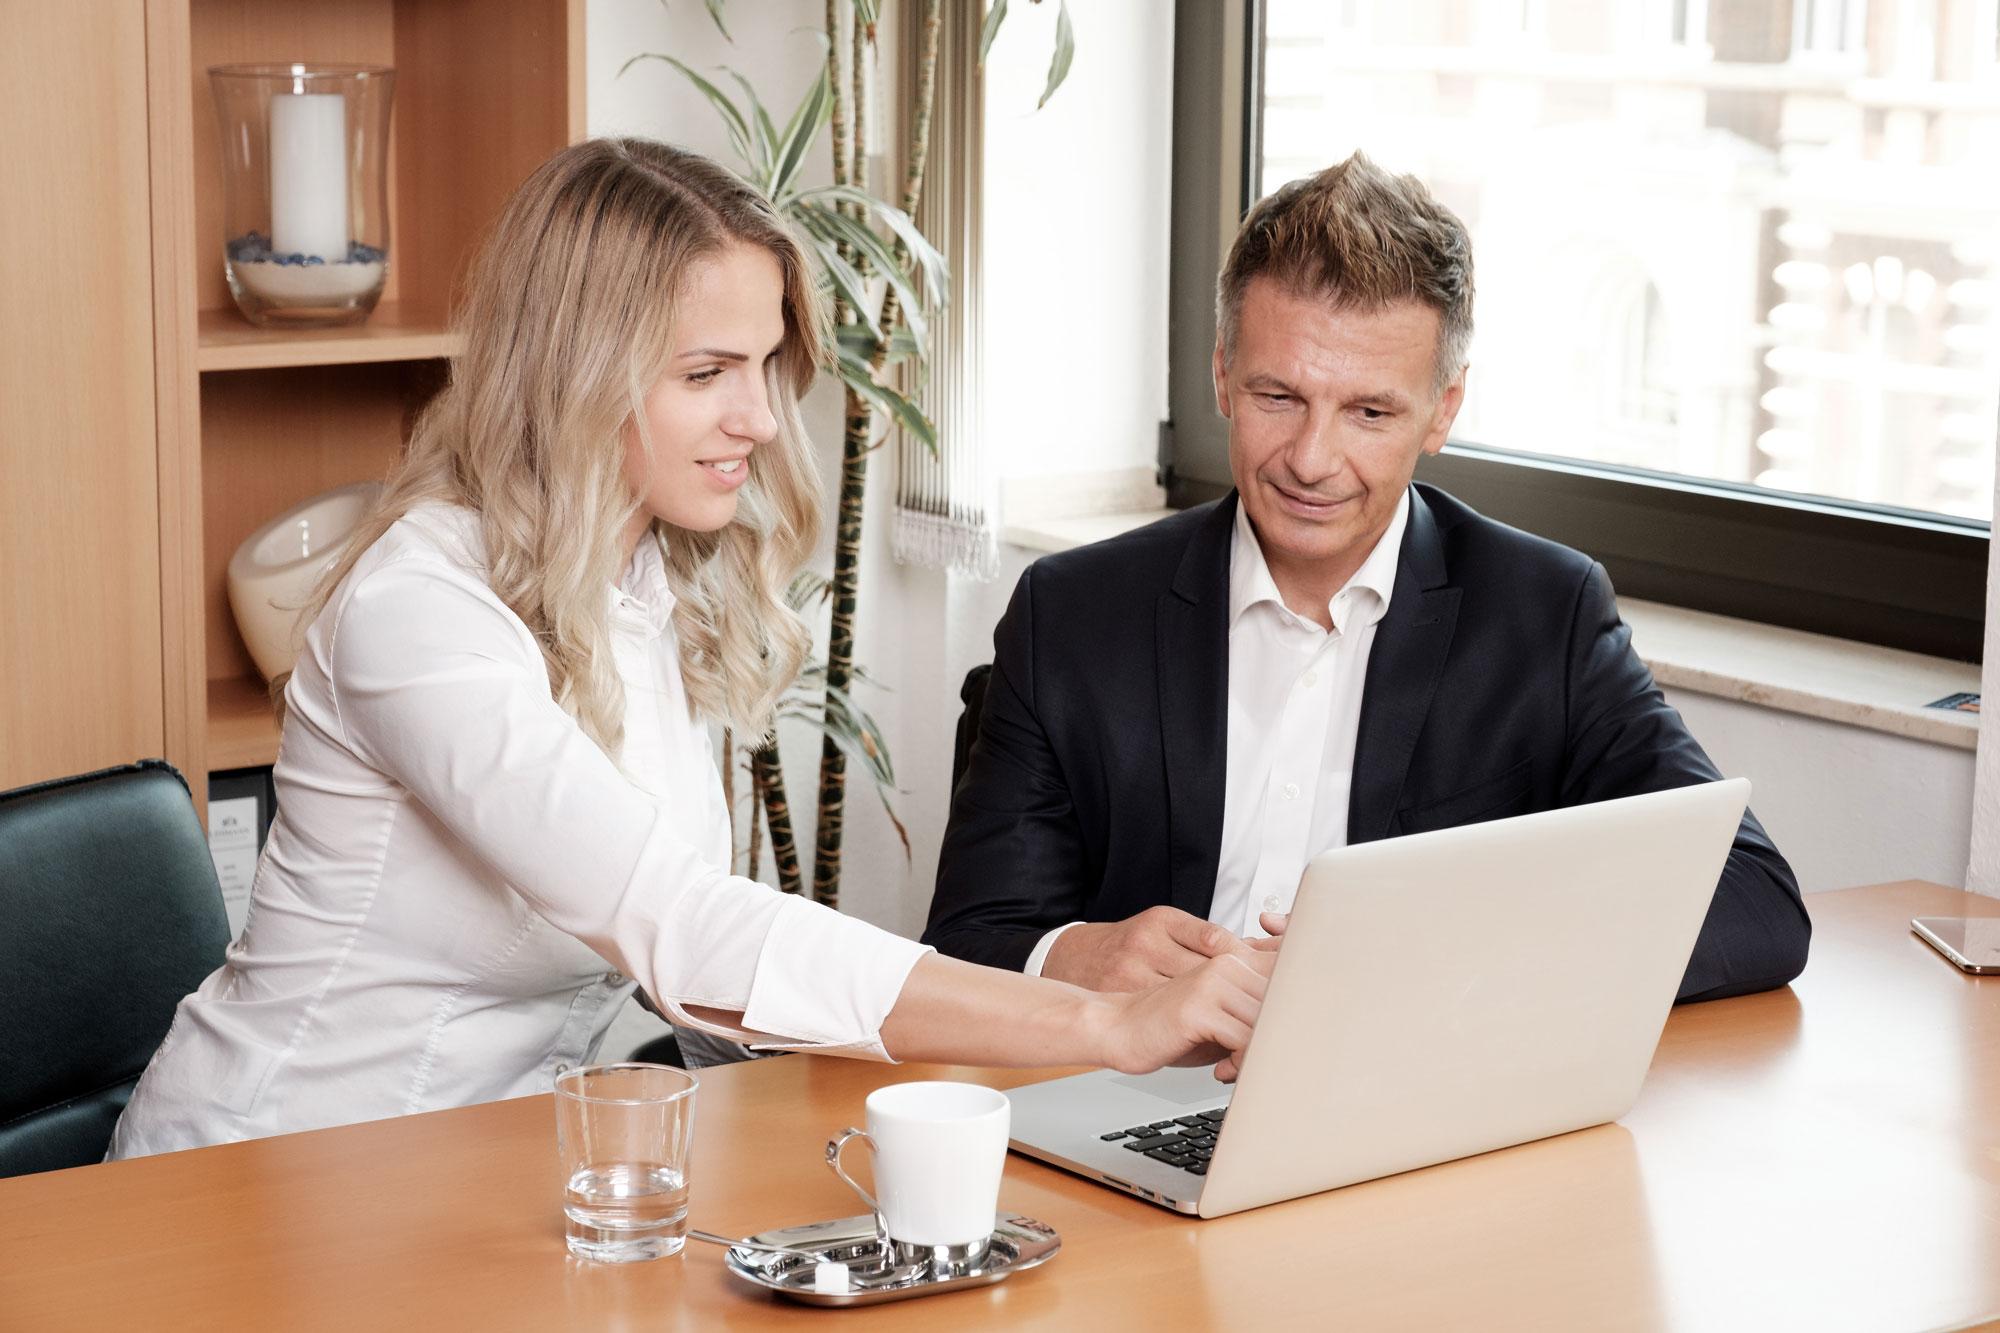 Beratungssituation bei Lehmann Finanzdialog, Versicherungsmakler in Bochum